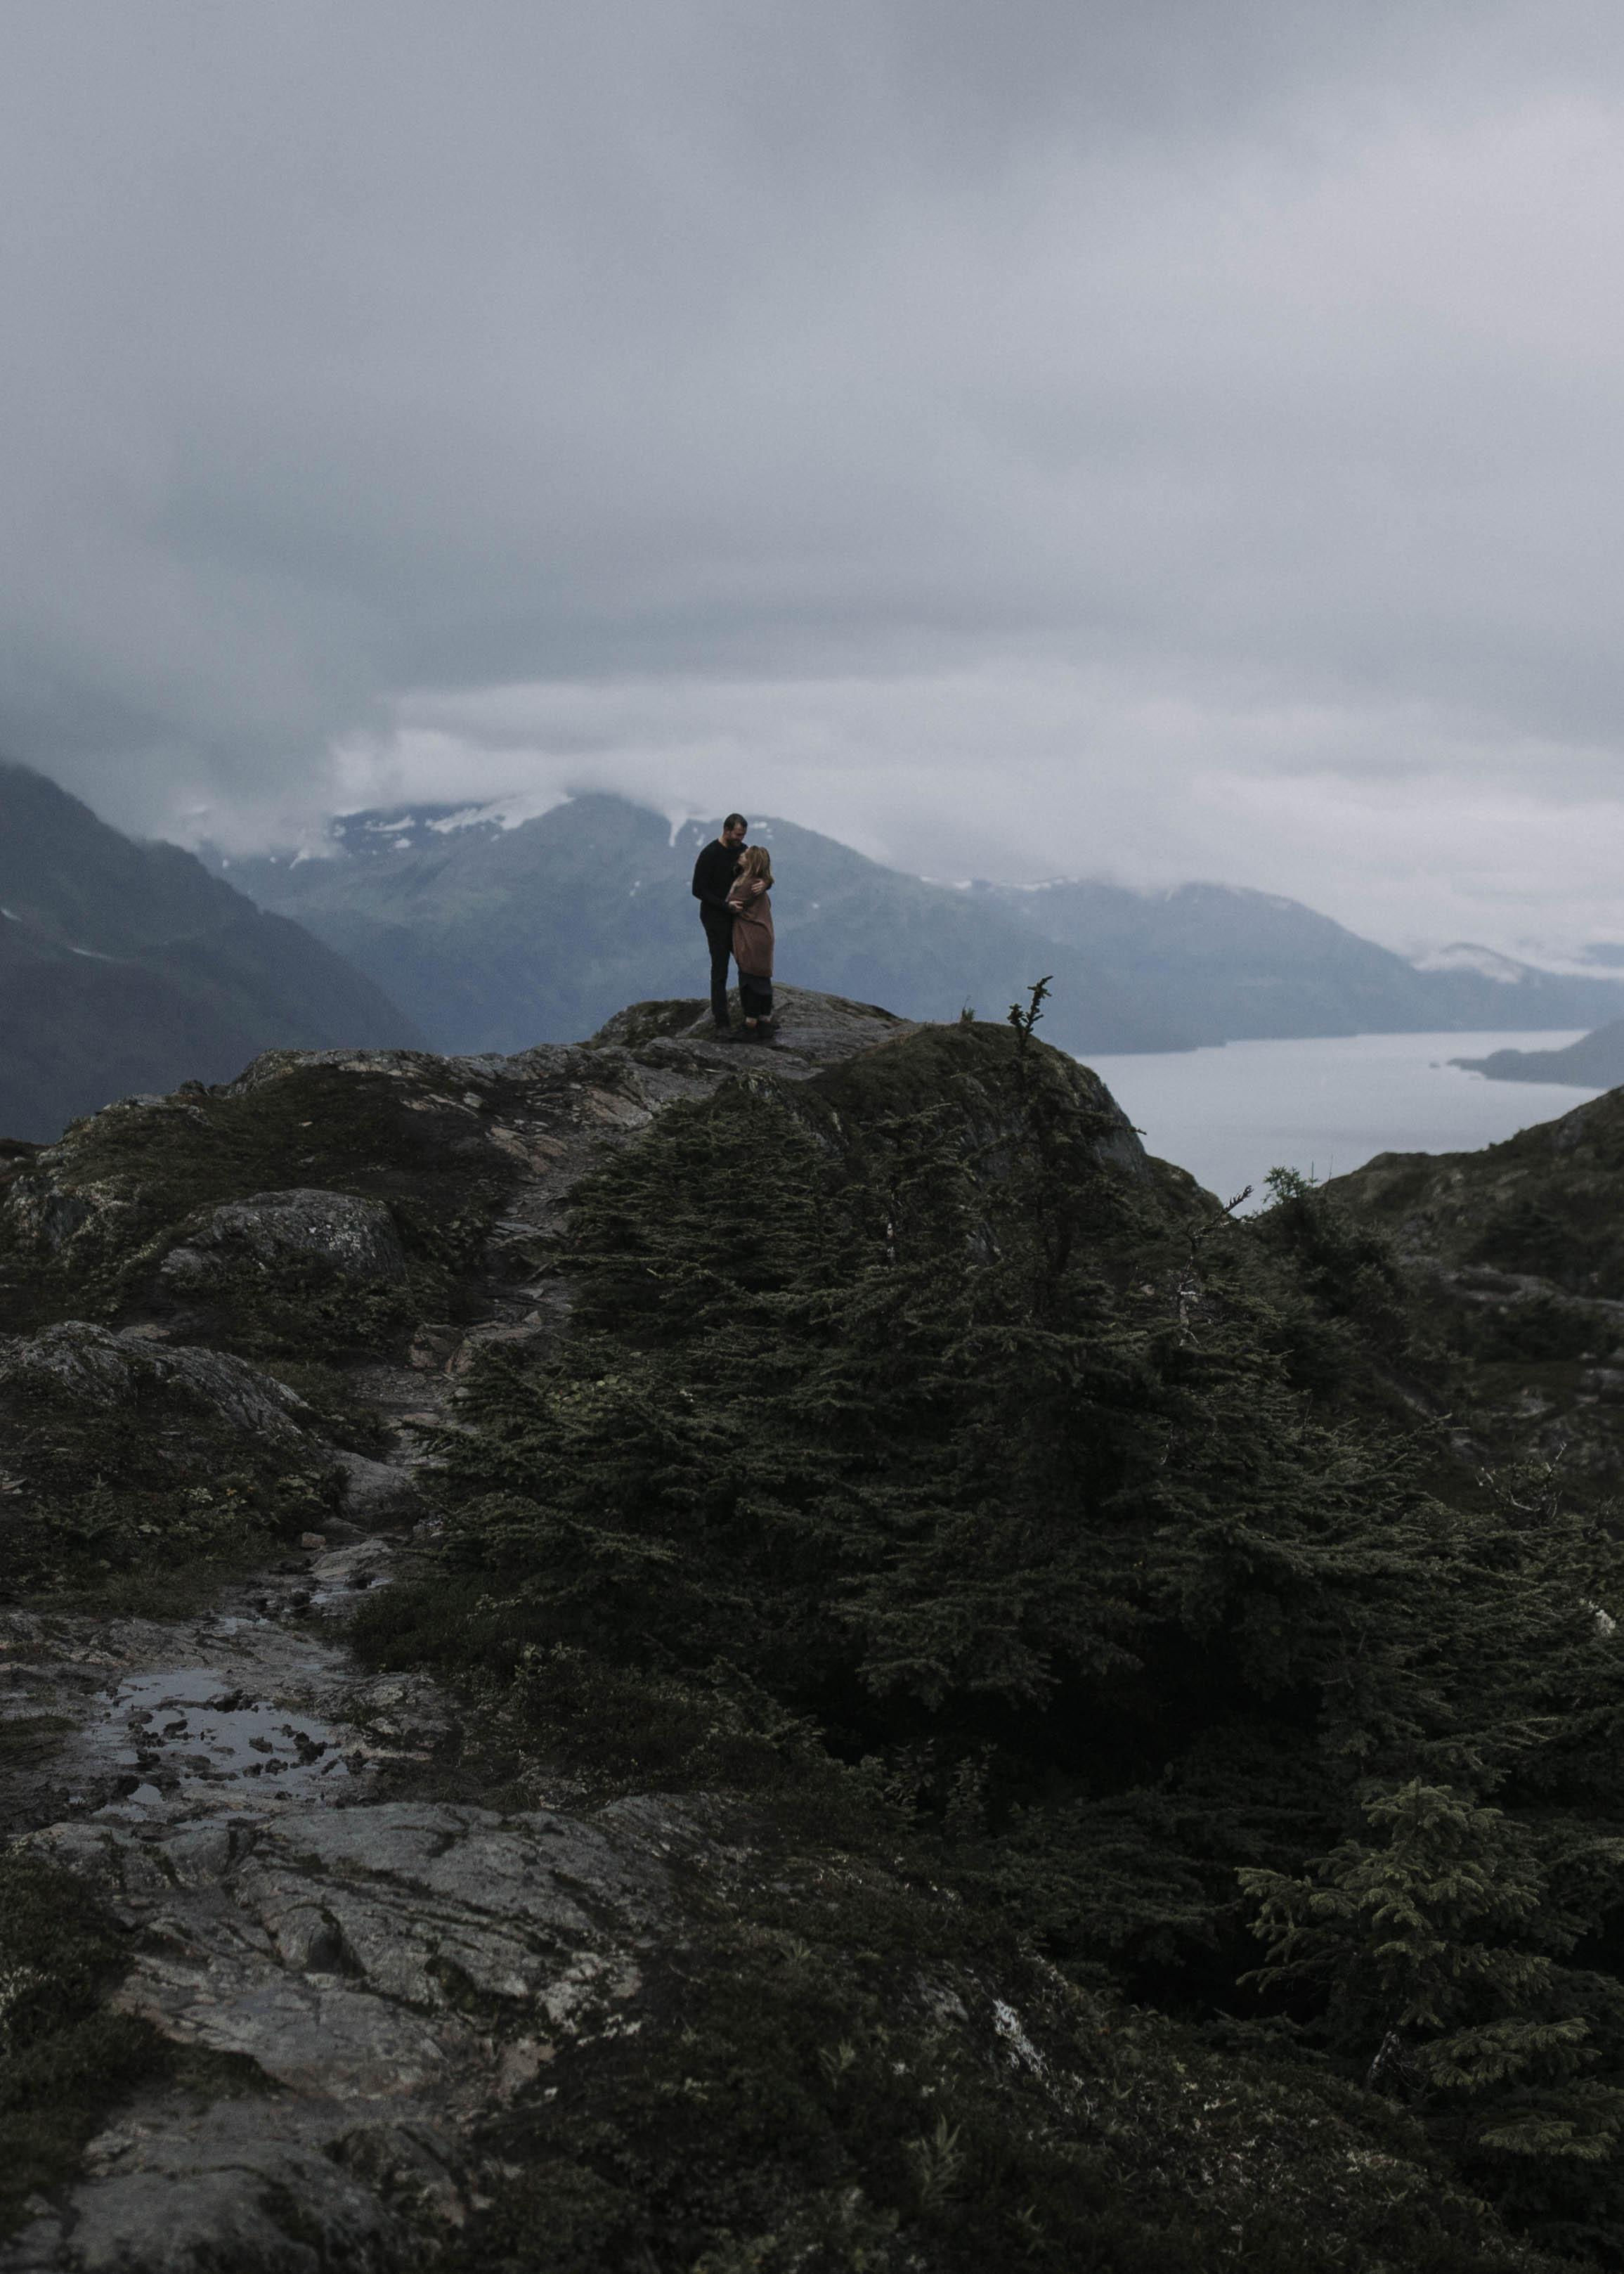 ariel-lynn-alaskan-mountain-couples-session-13.jpg